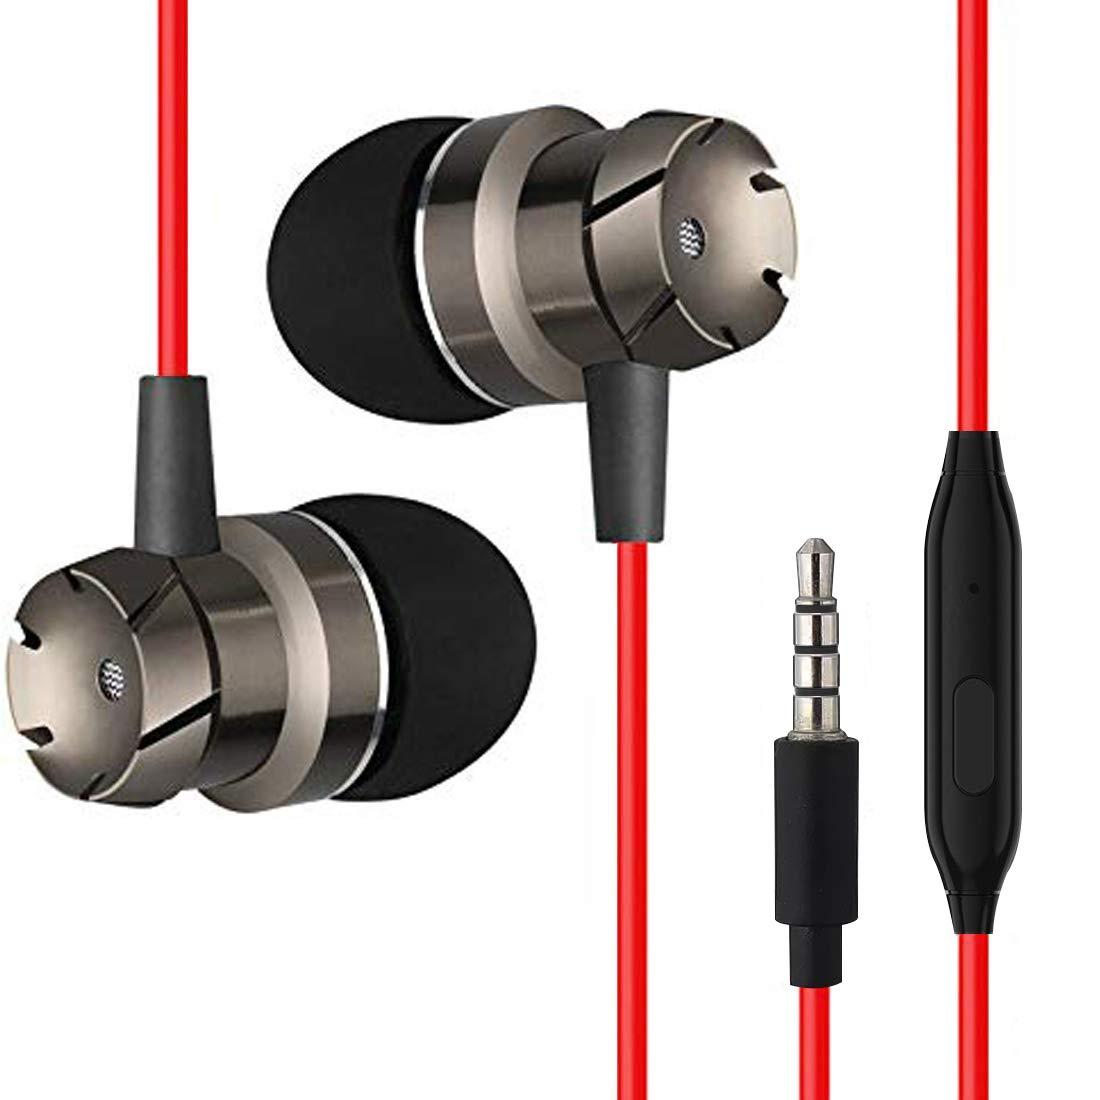 best earphones under 150, best earphones under 200 Rs